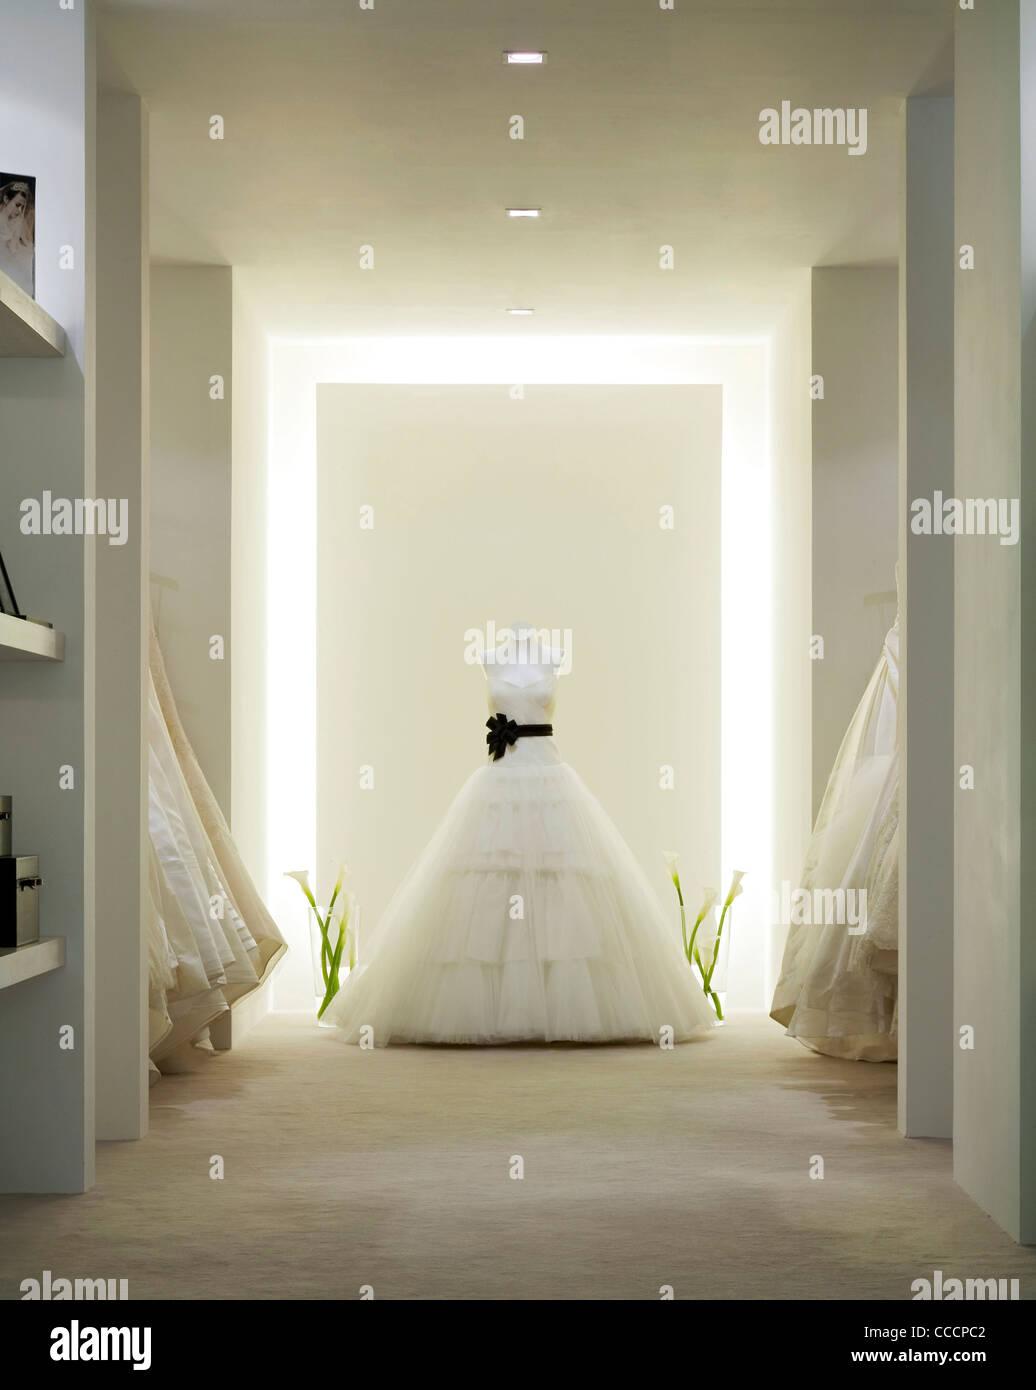 VERA WANG WEDDING SHOP SHOP INTERIOR - Stock Image